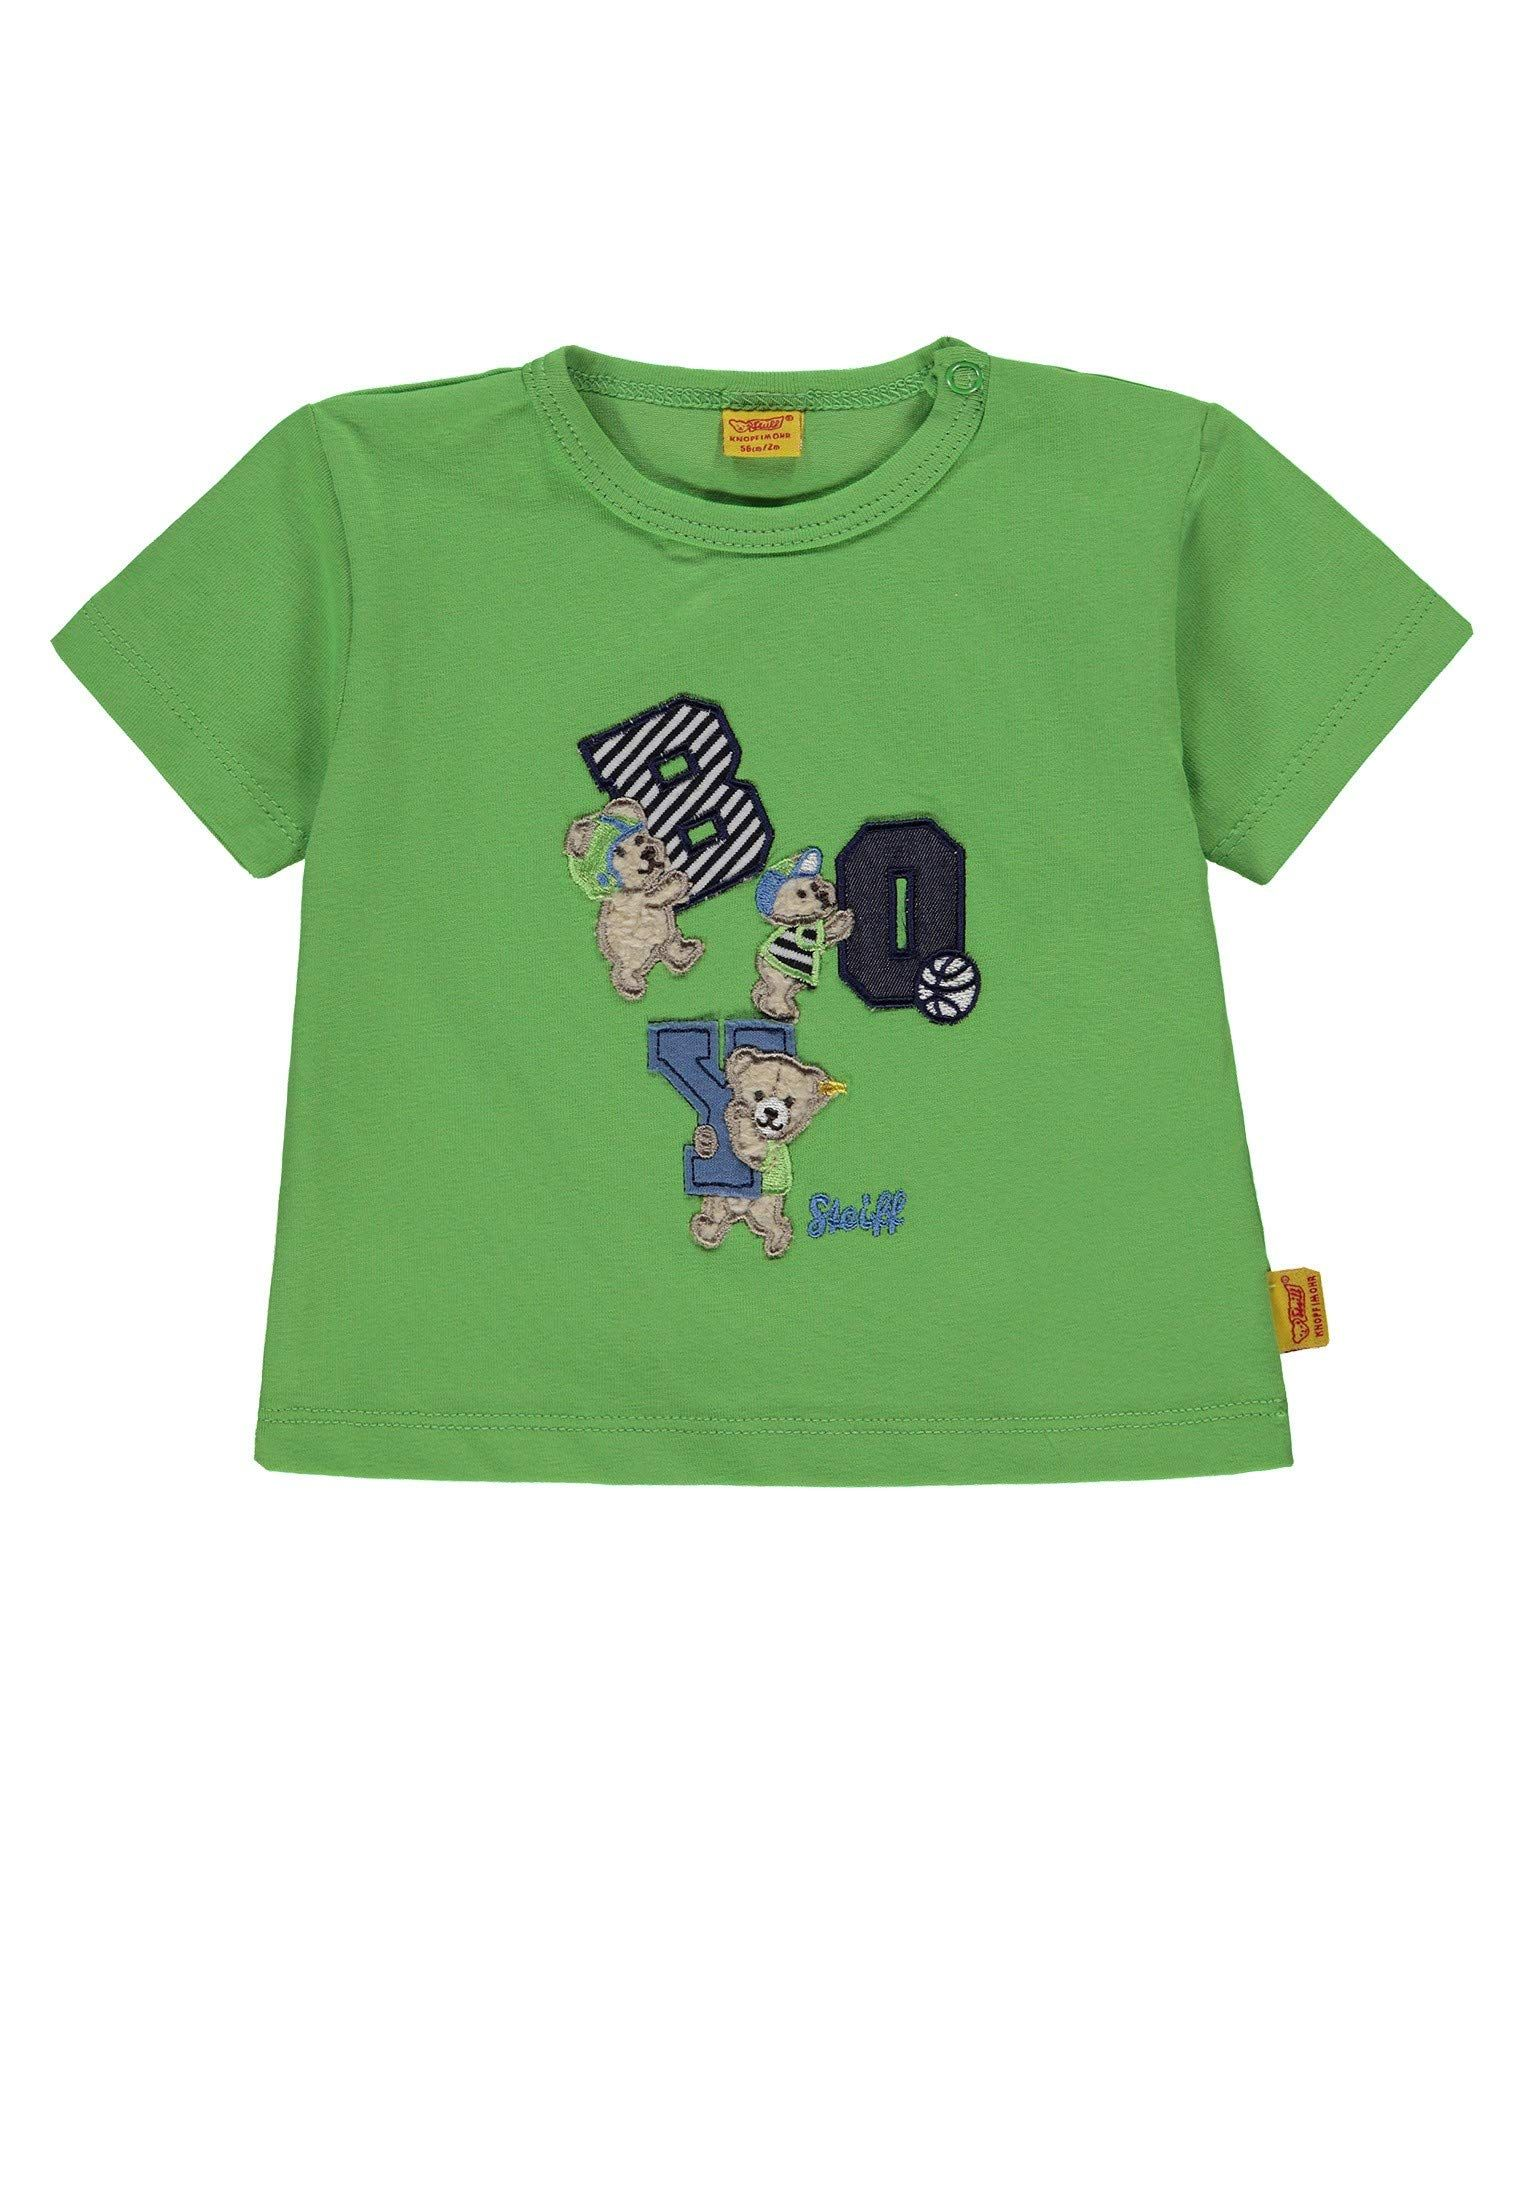 Steiff Baby Jungen T Shirt Baby T Shirts Steiff Baby Shirts